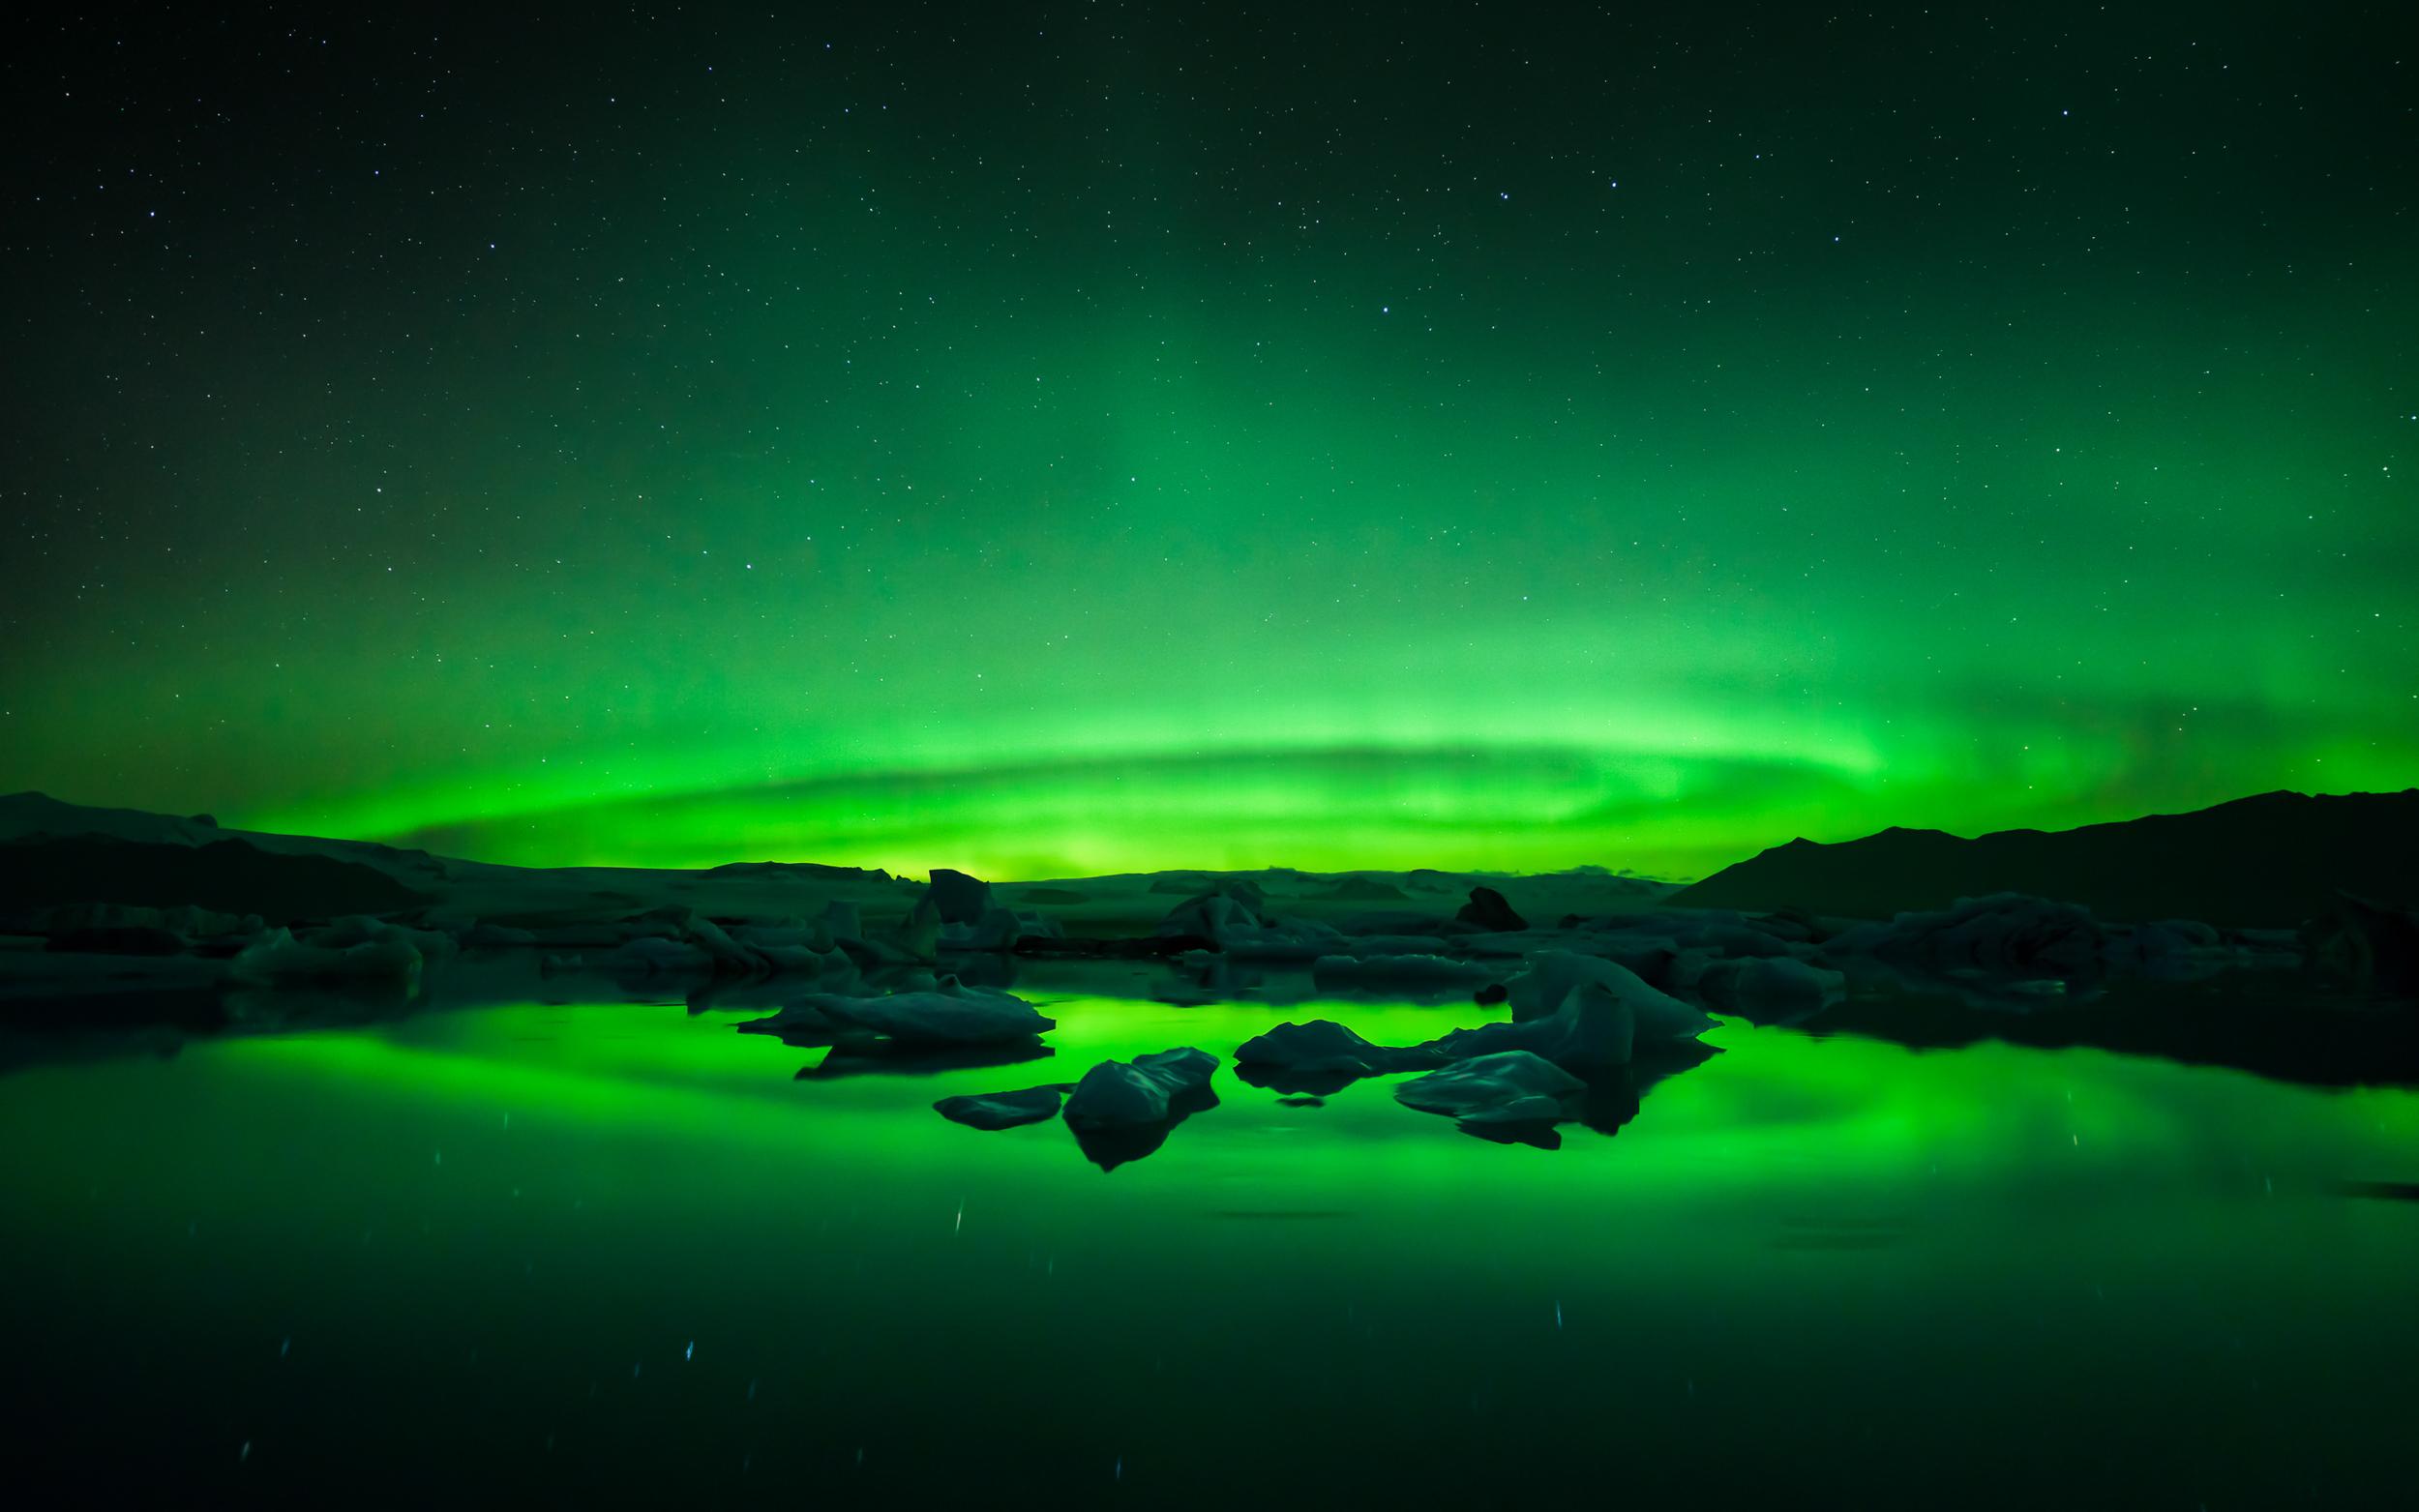 A fantastic active Aurora (Northern Lights) over the Jökulsárlón Glacier Lagoon in Iceland